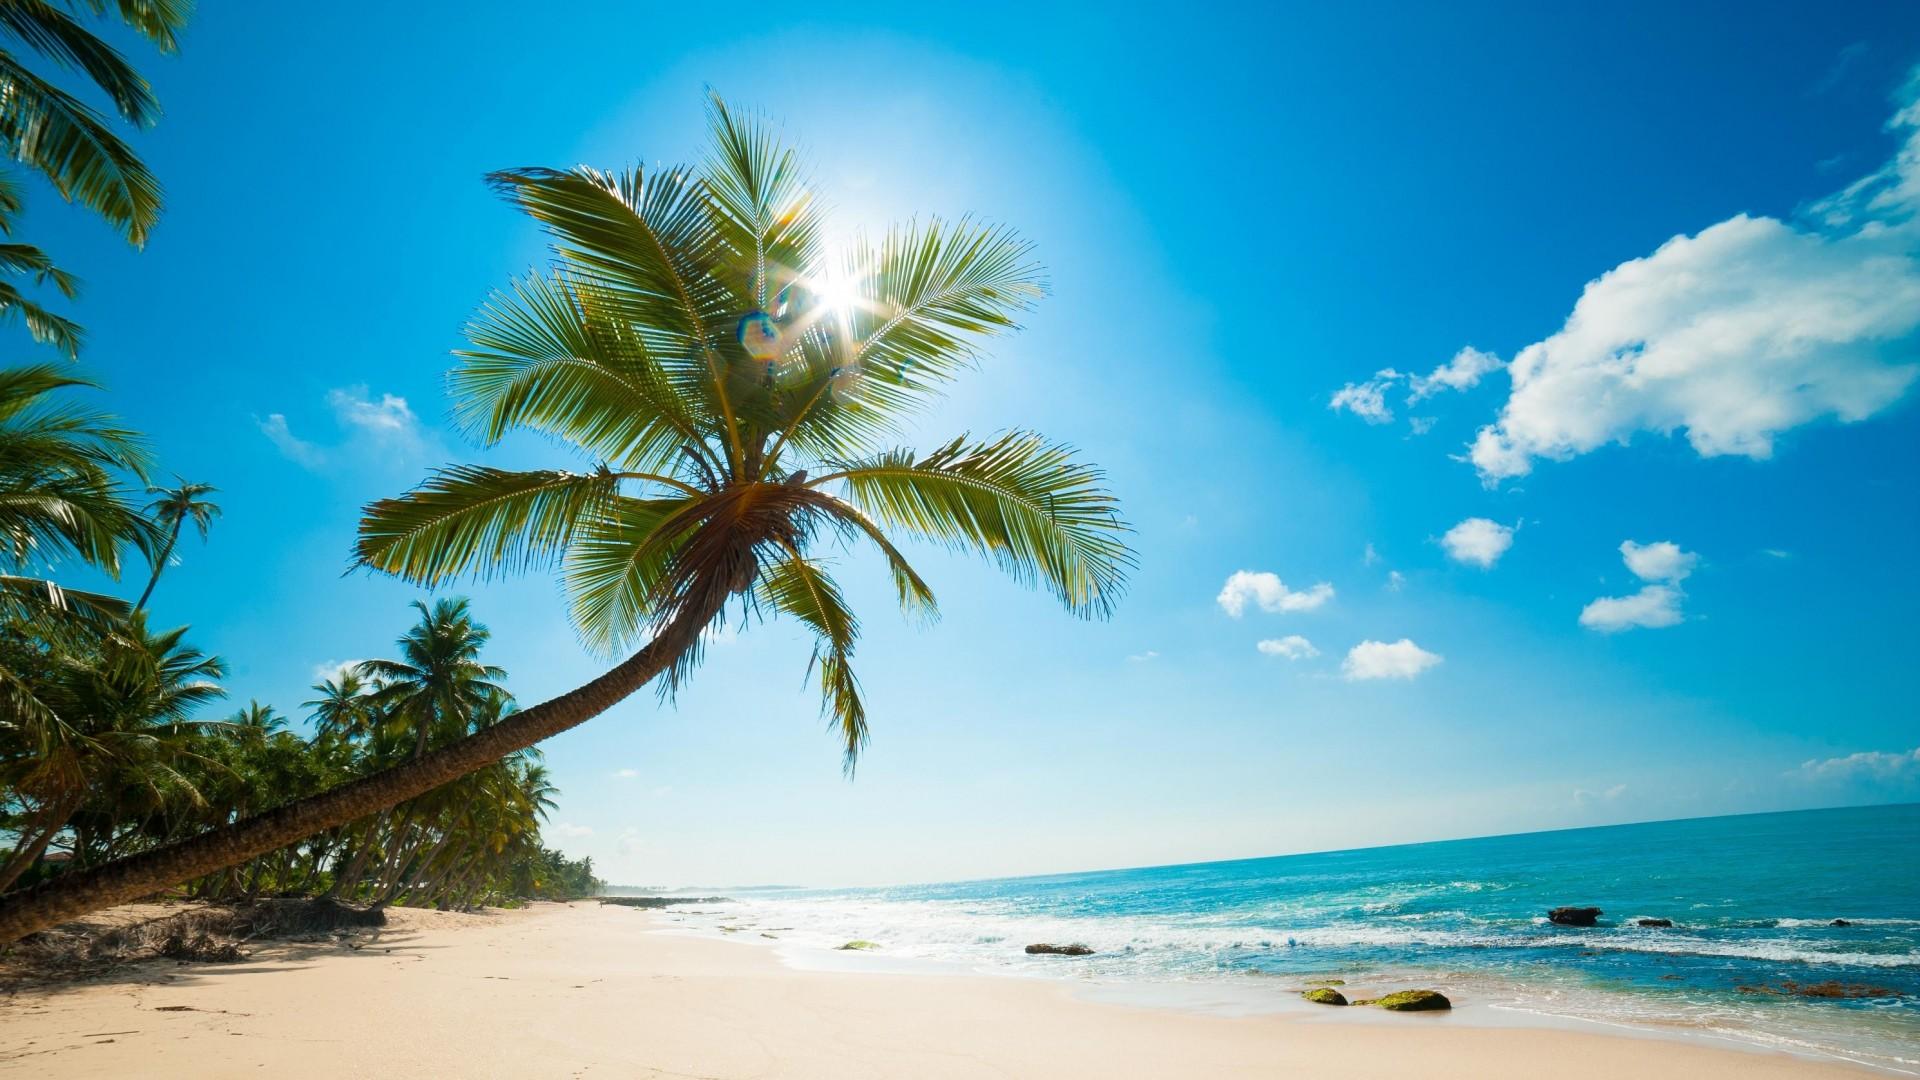 Beach side nature hd wallpaper 1080p